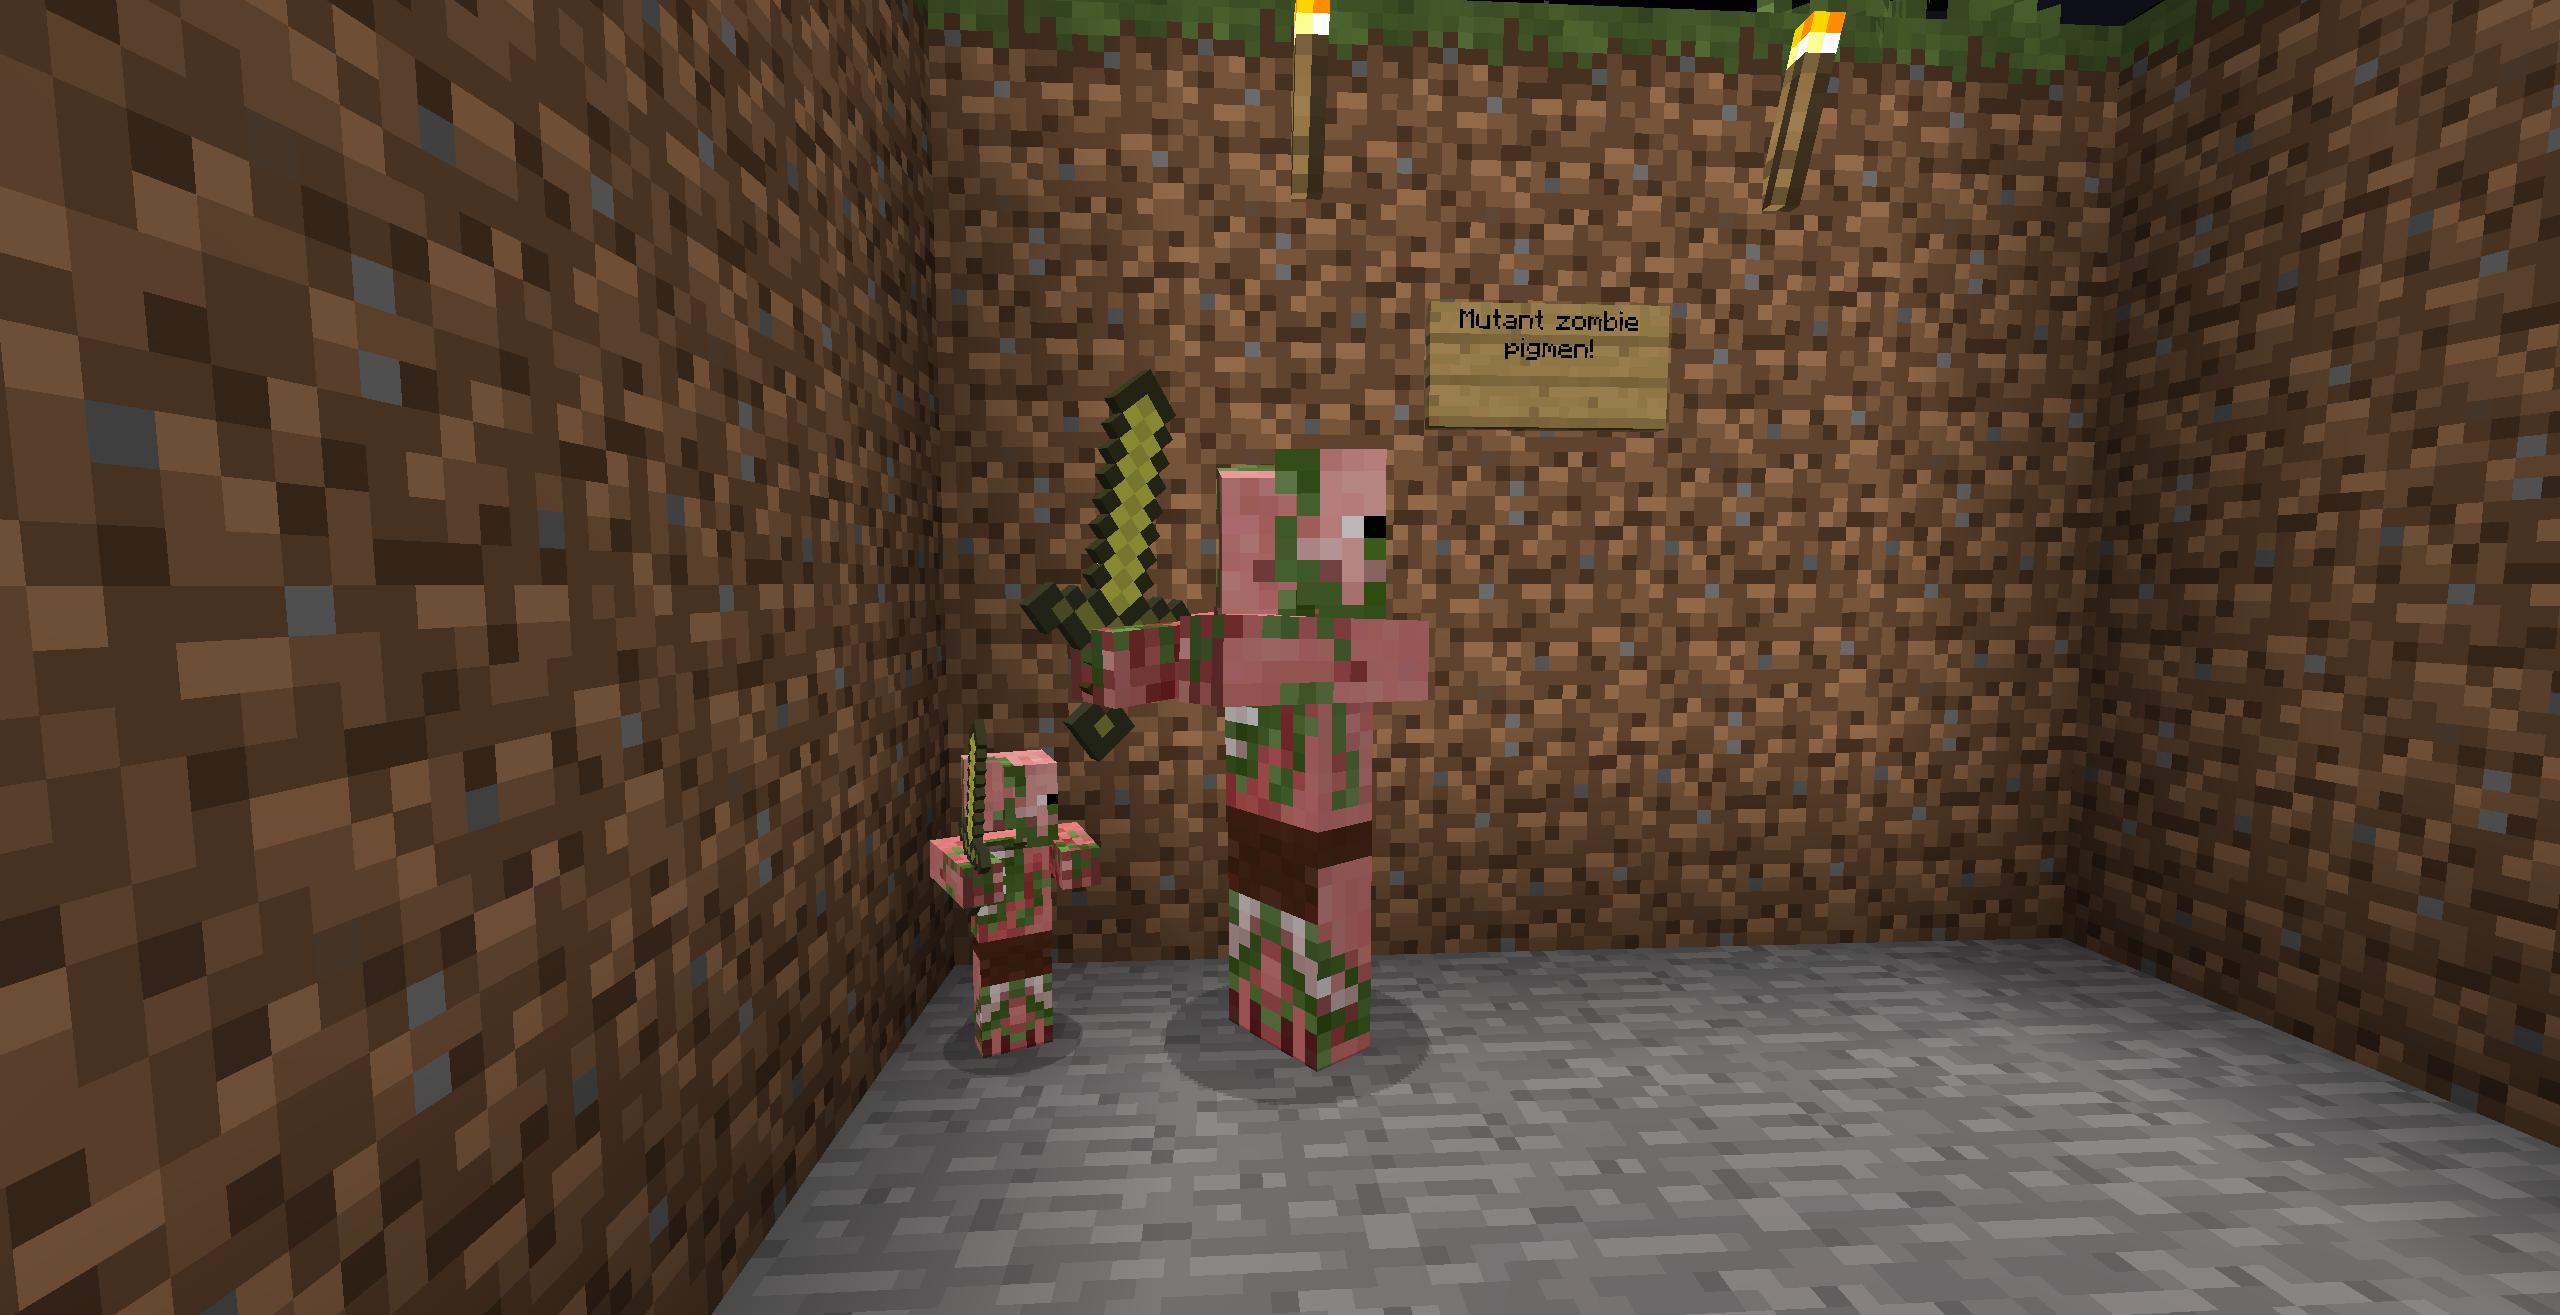 Mutant zombie pigman vs mutant zombie - photo#15